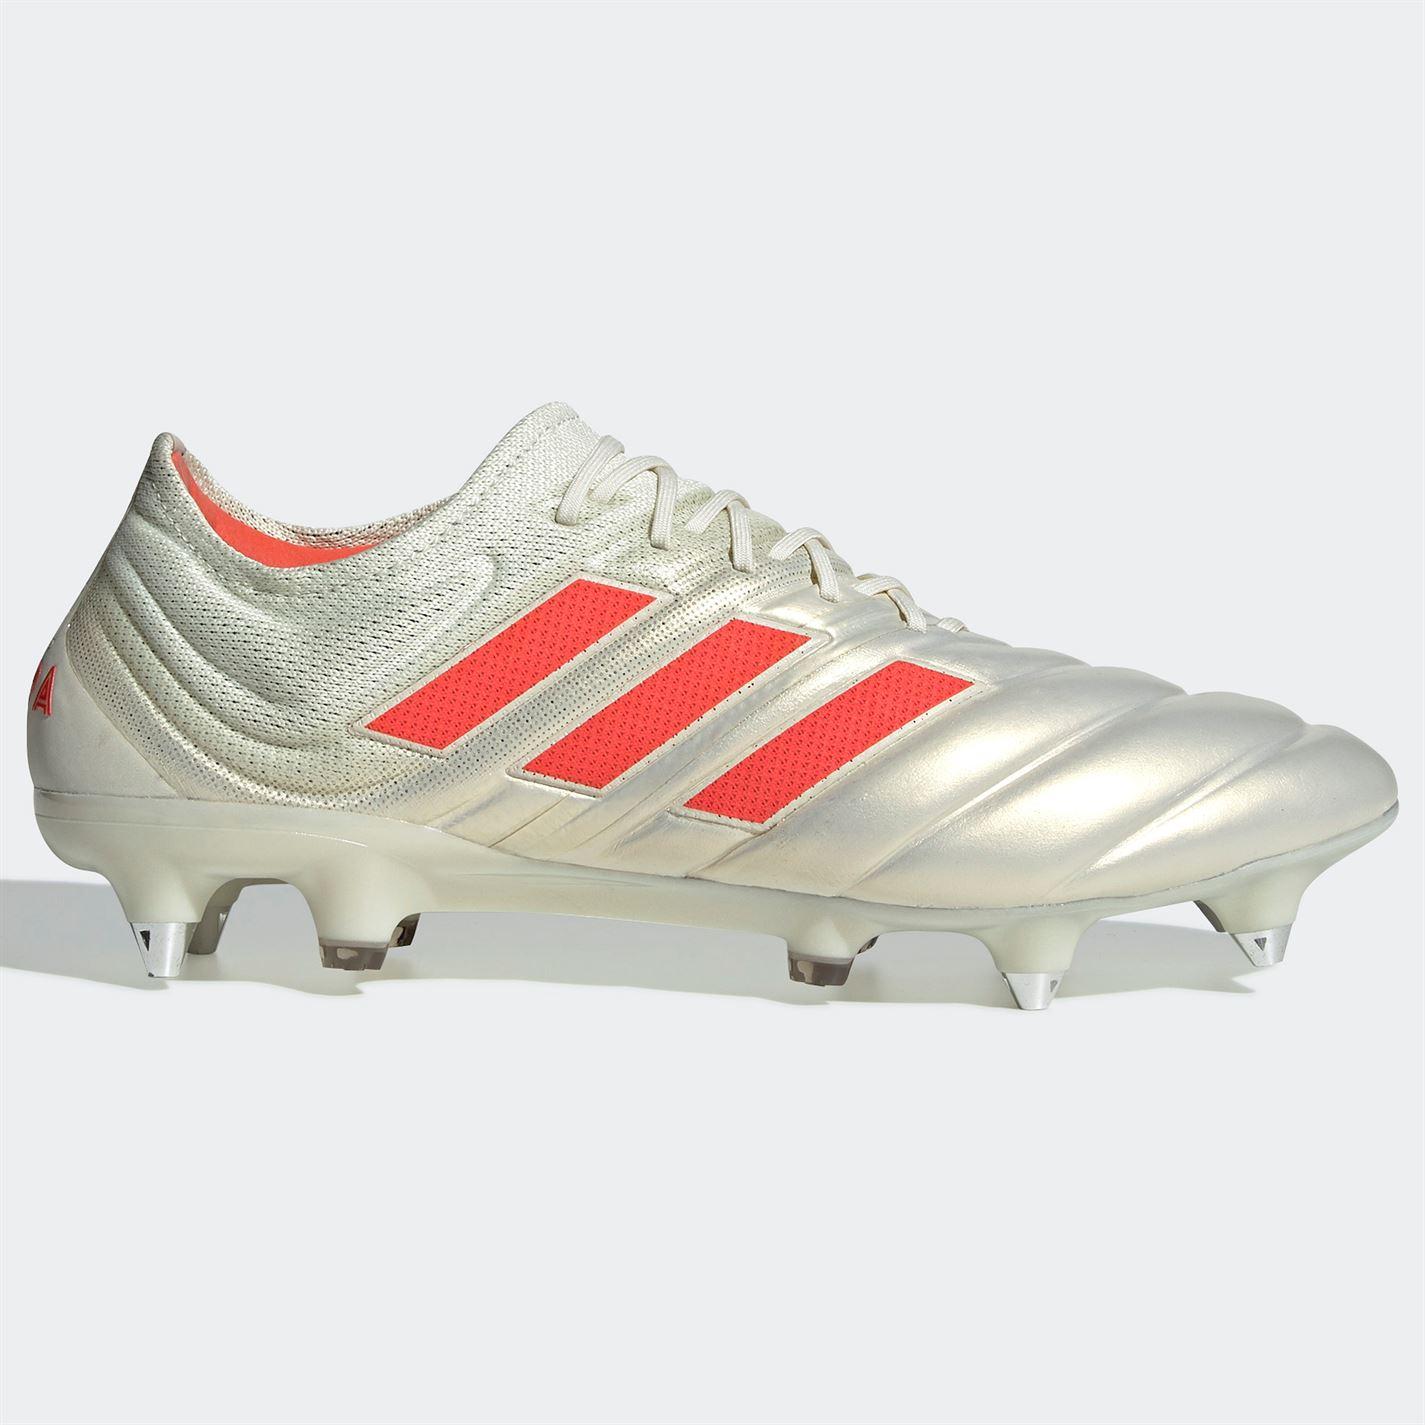 kopačky adidas Copa 19.1 pánské SG